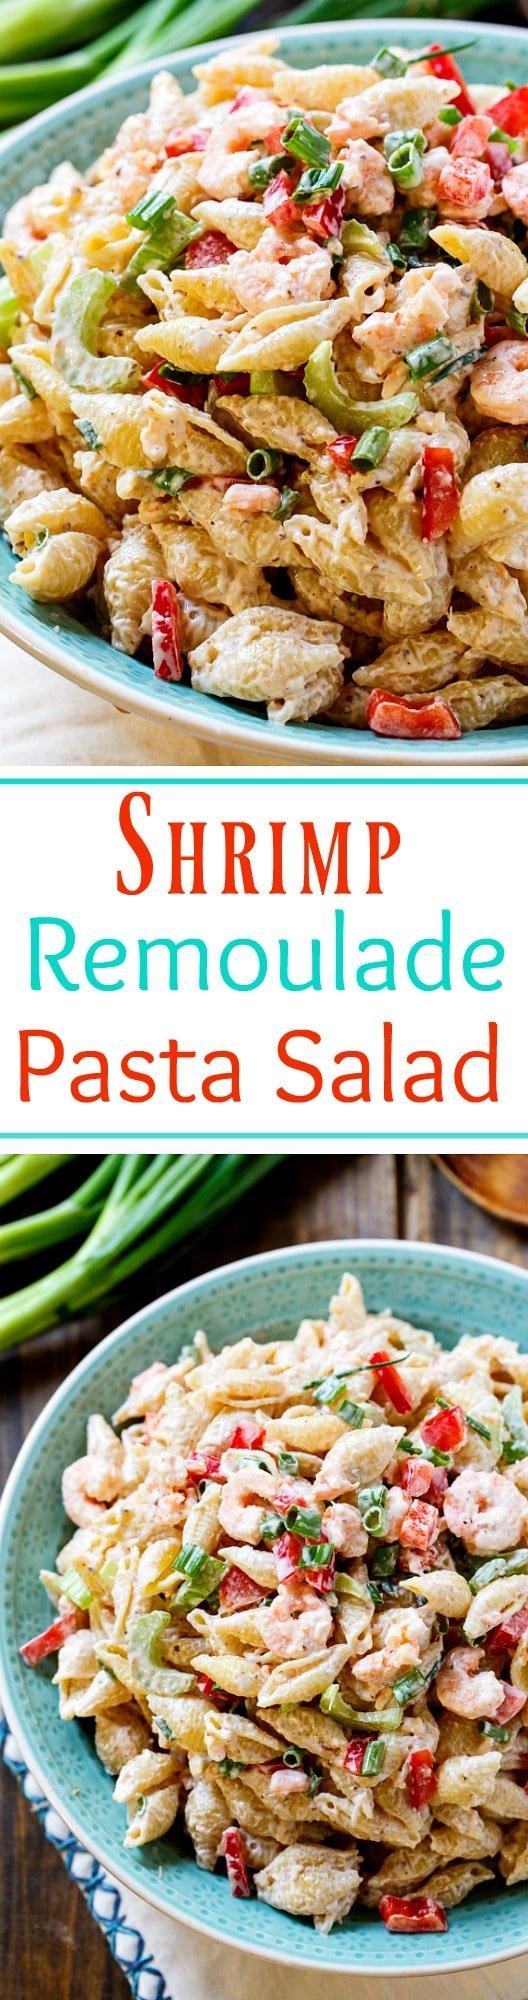 Shrimp Remoulade Pasta Salad- perfect for Mardi Gras!